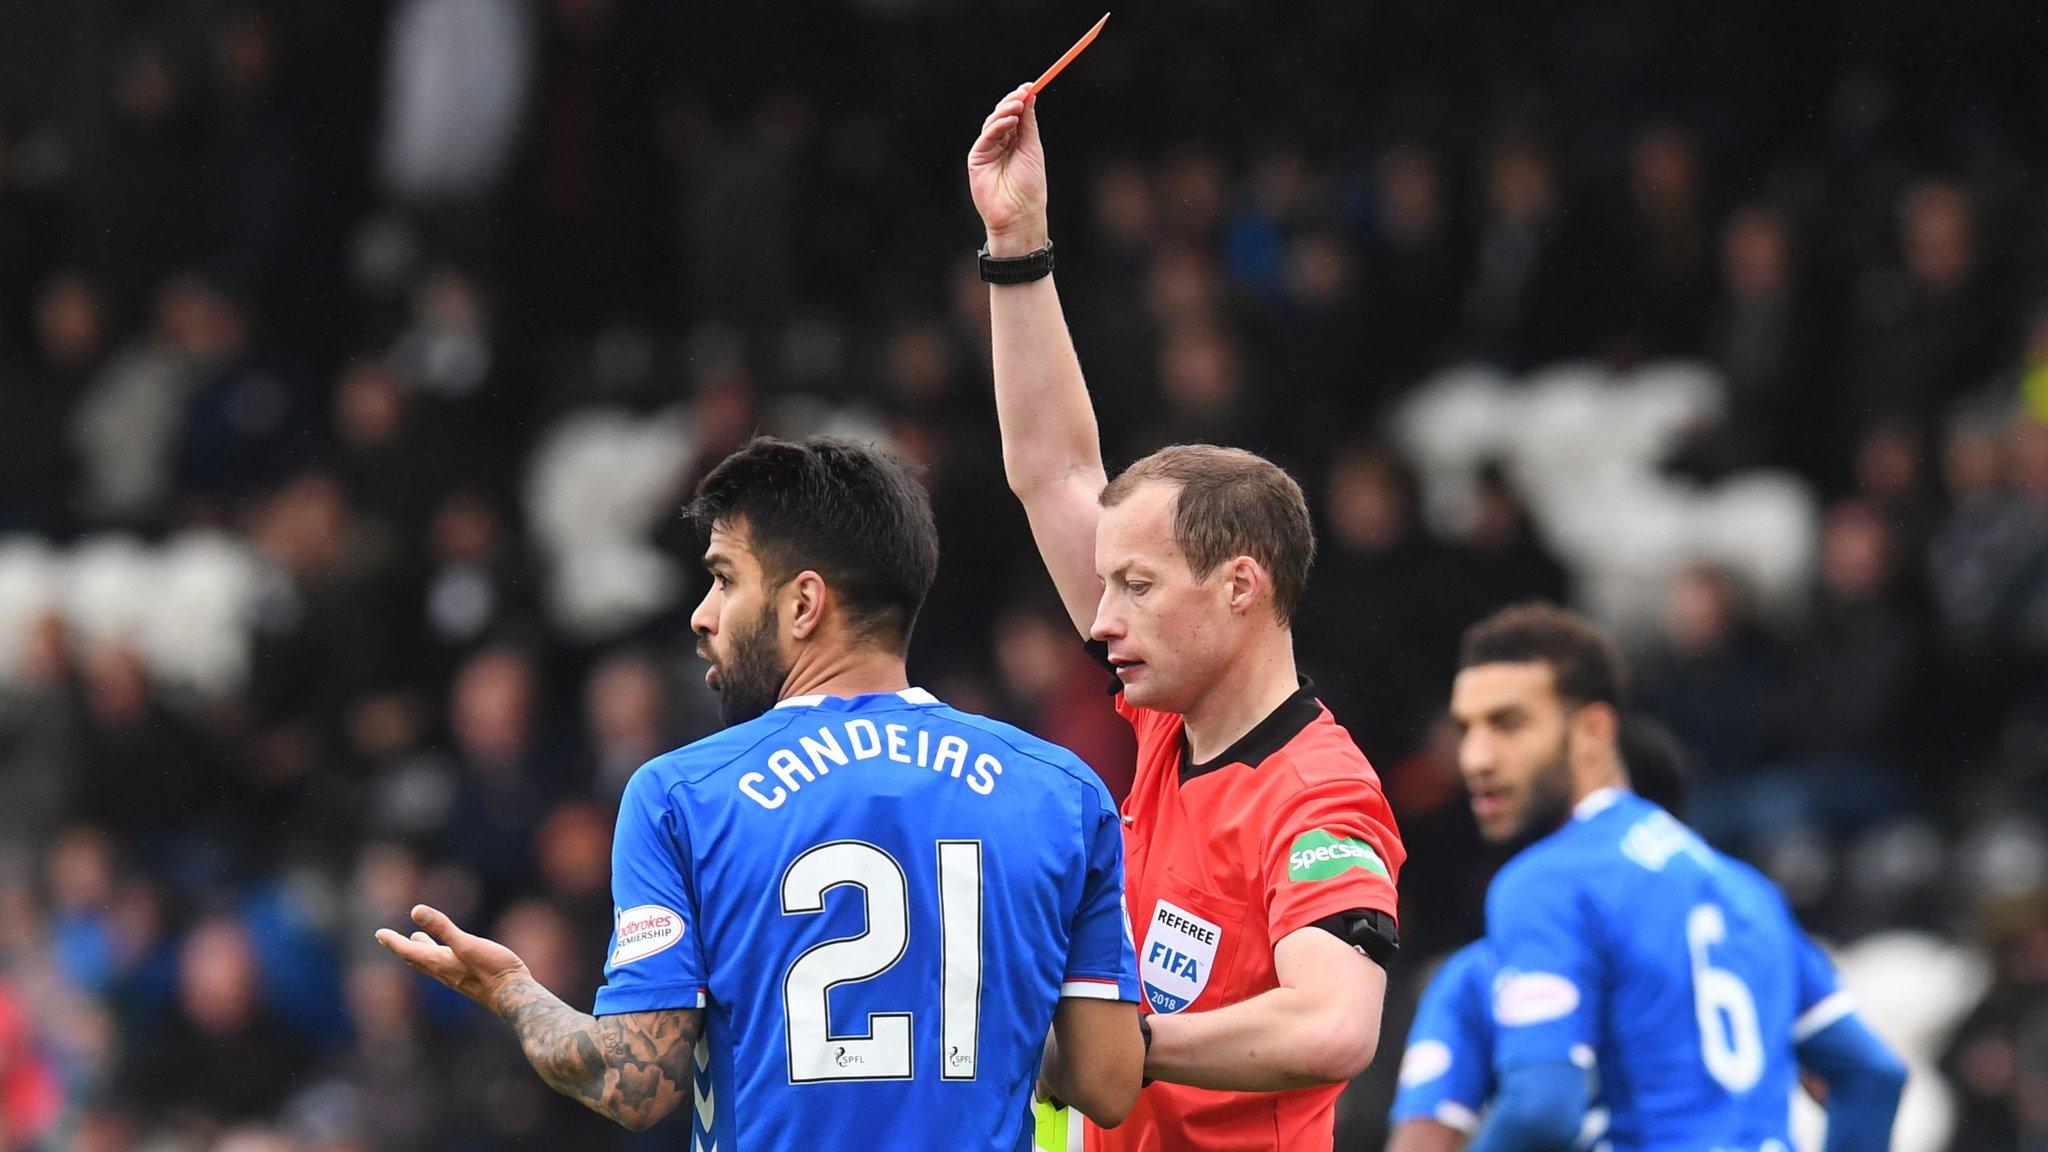 Daniel Candeias: Rangers winger's second yellow card v St Mirren for 'gestures' to Anton Ferdinand